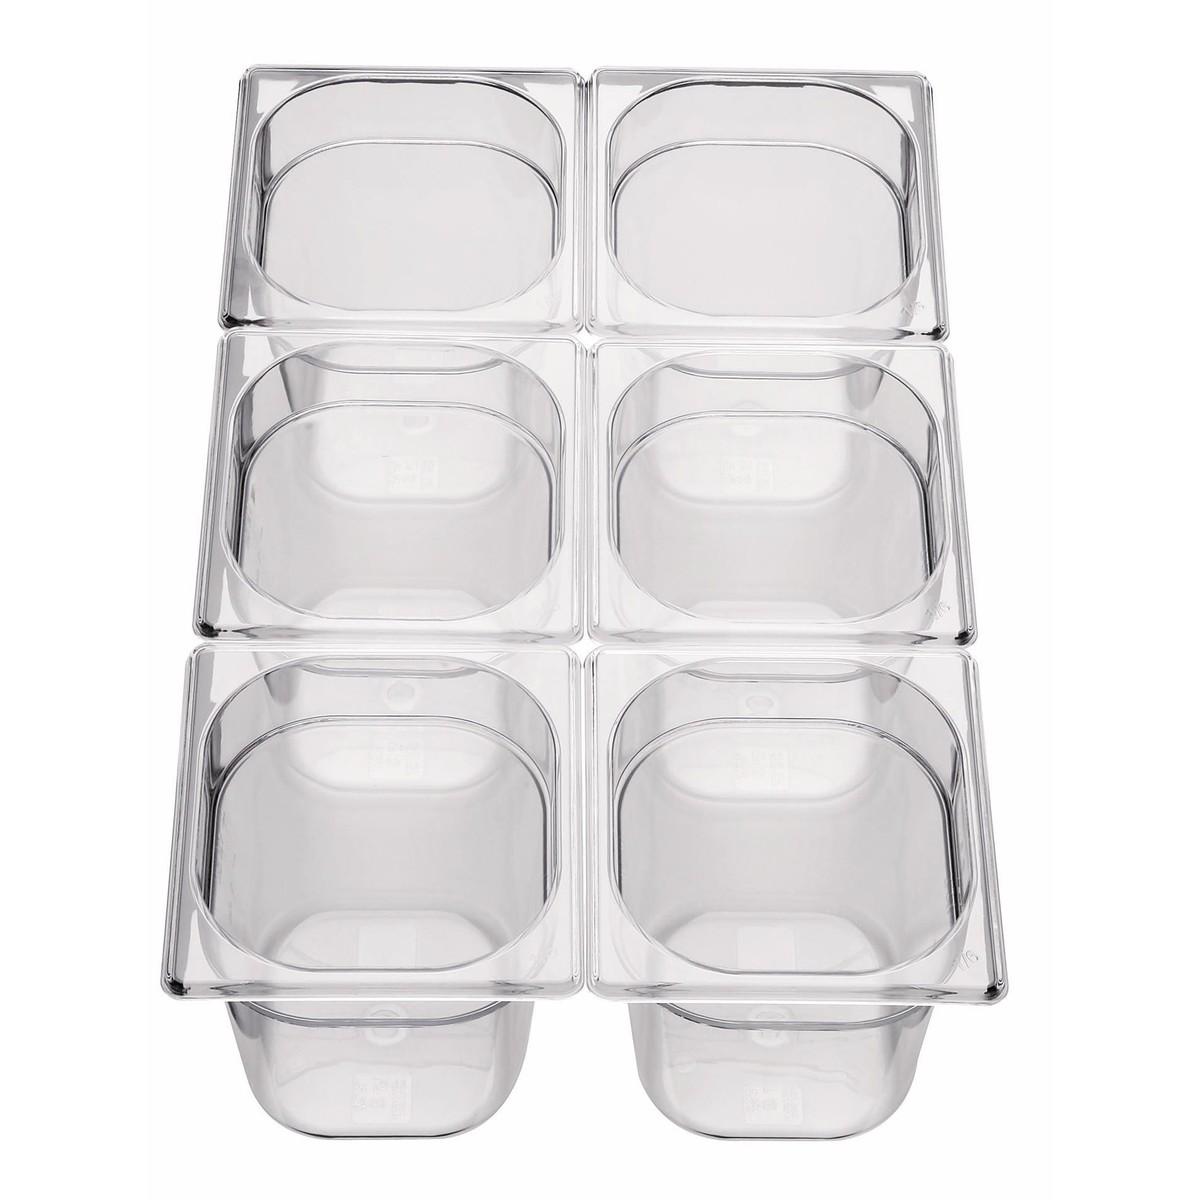 GN-Behälter 1/6 Polycarbonat 150mm